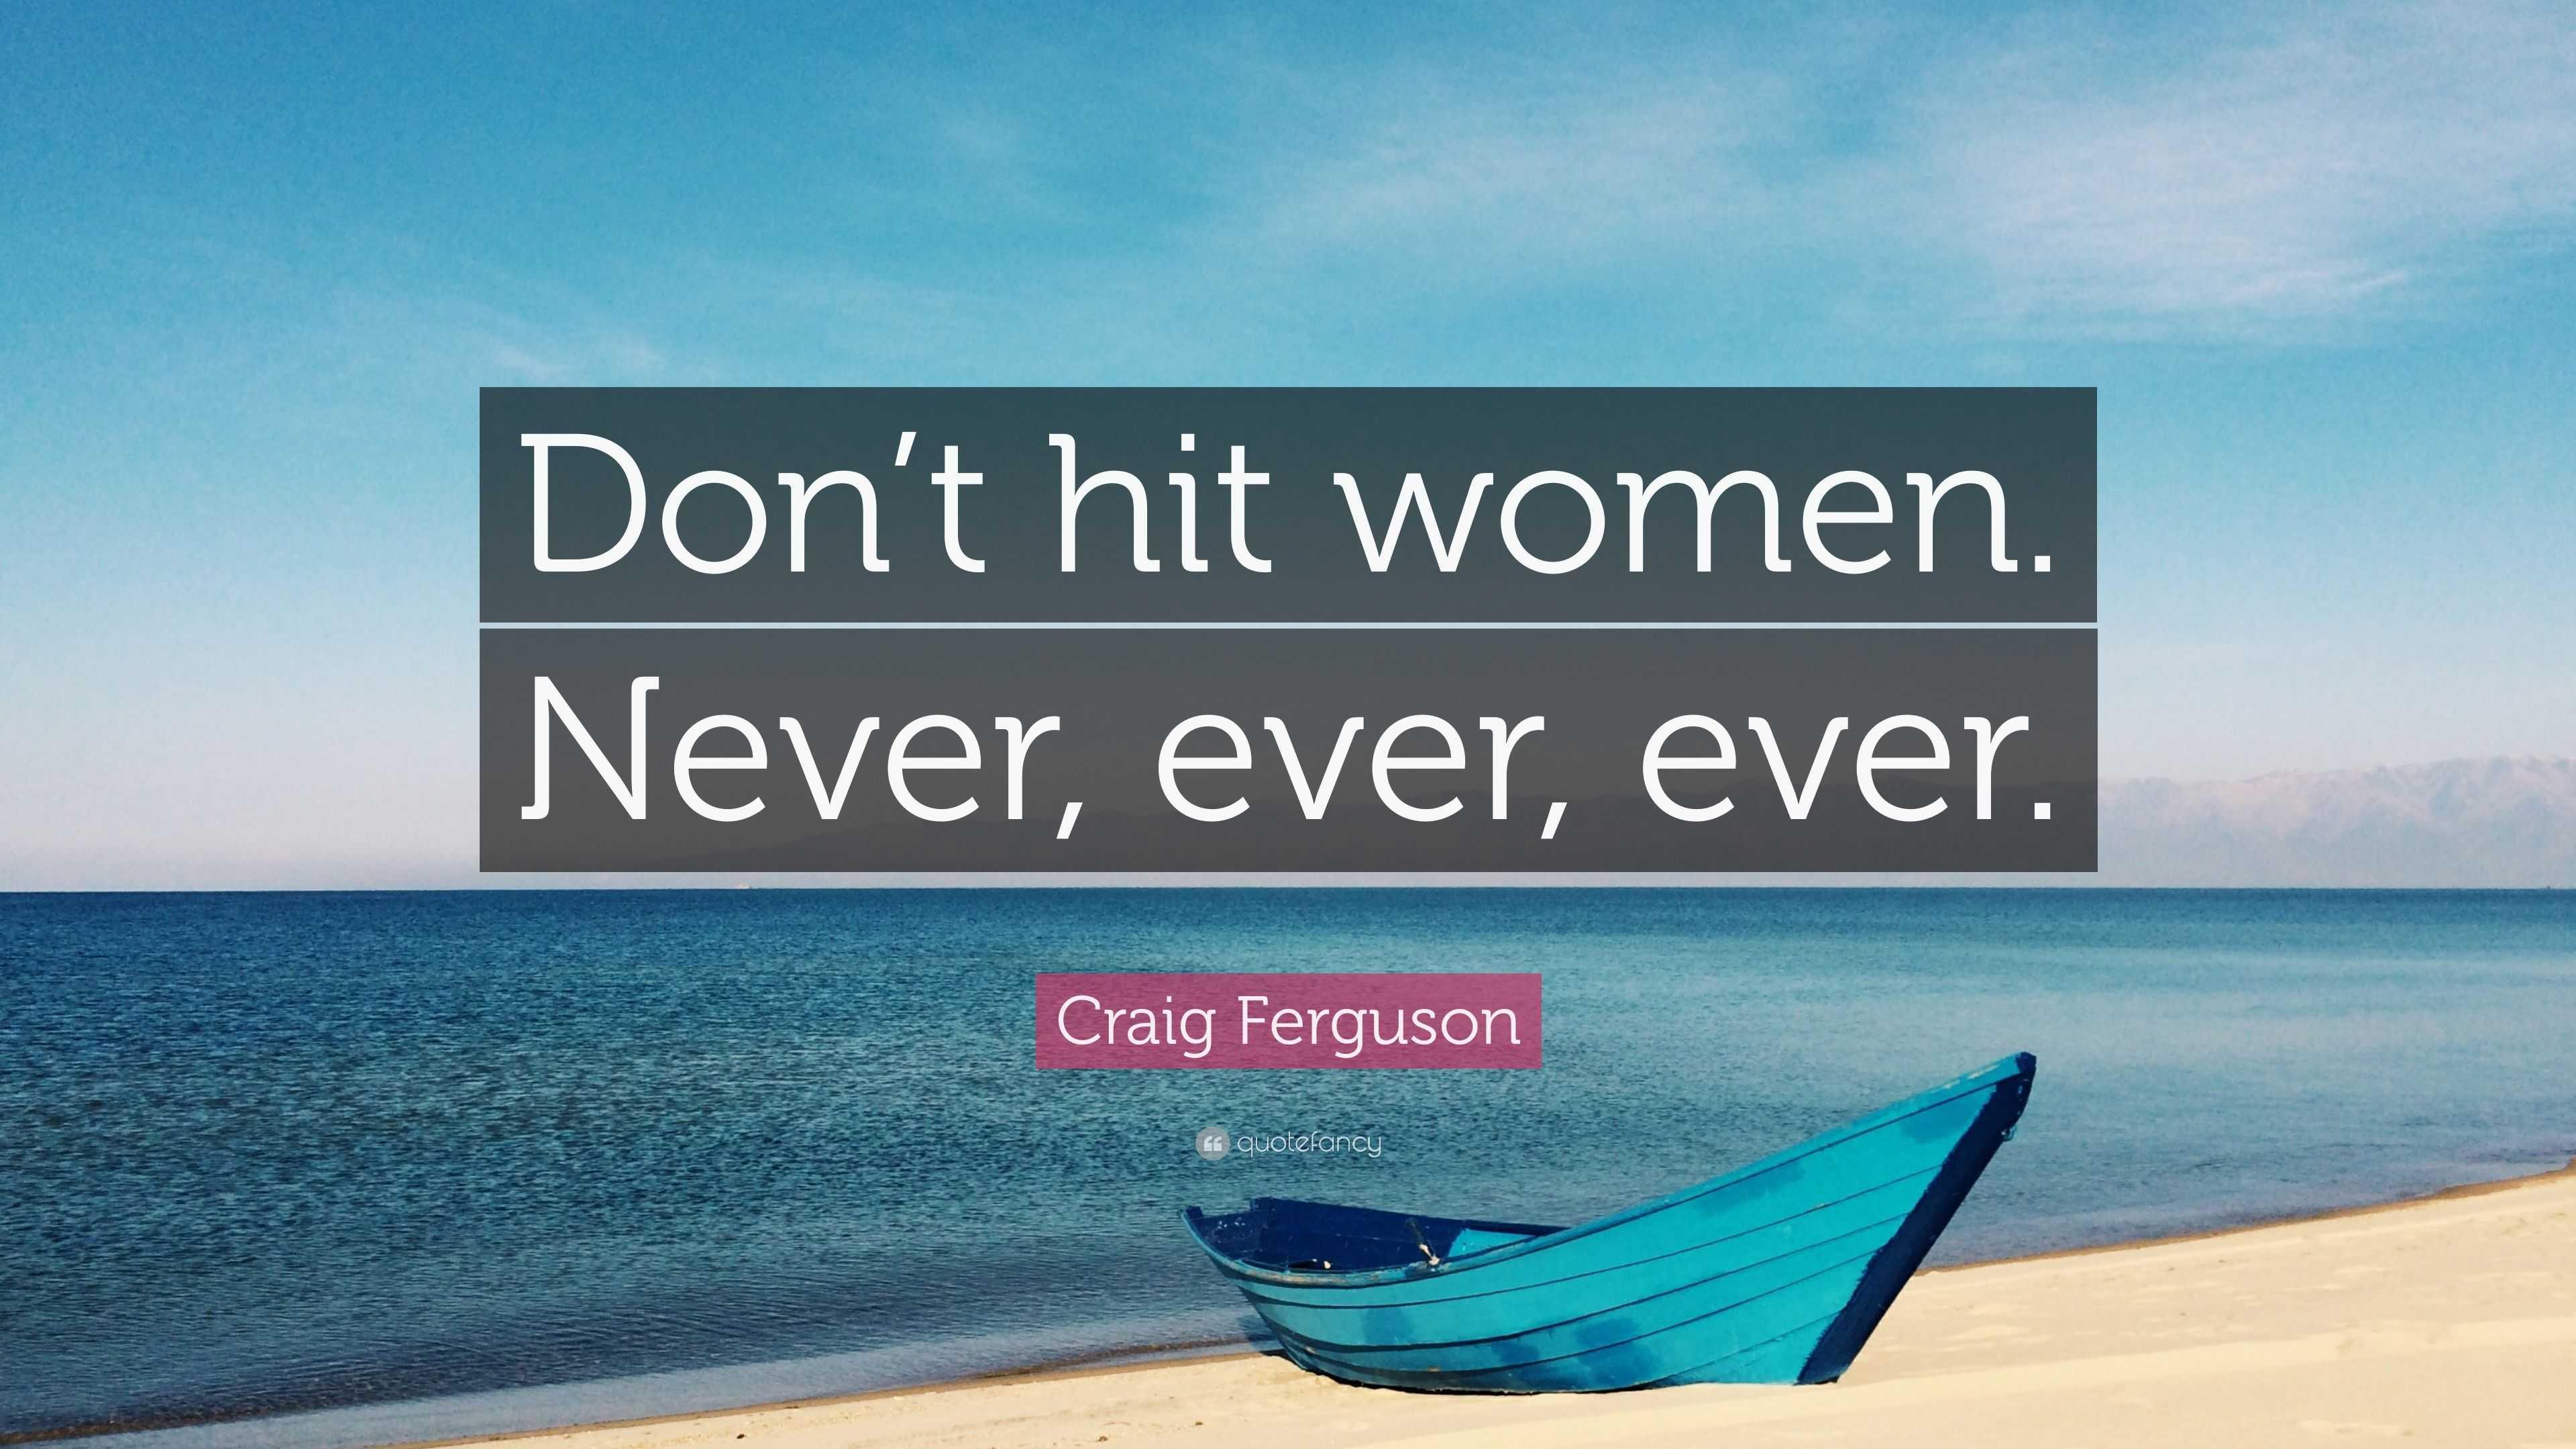 Craig Ferguson Quote: Dont hit women. Never, ever, ever.